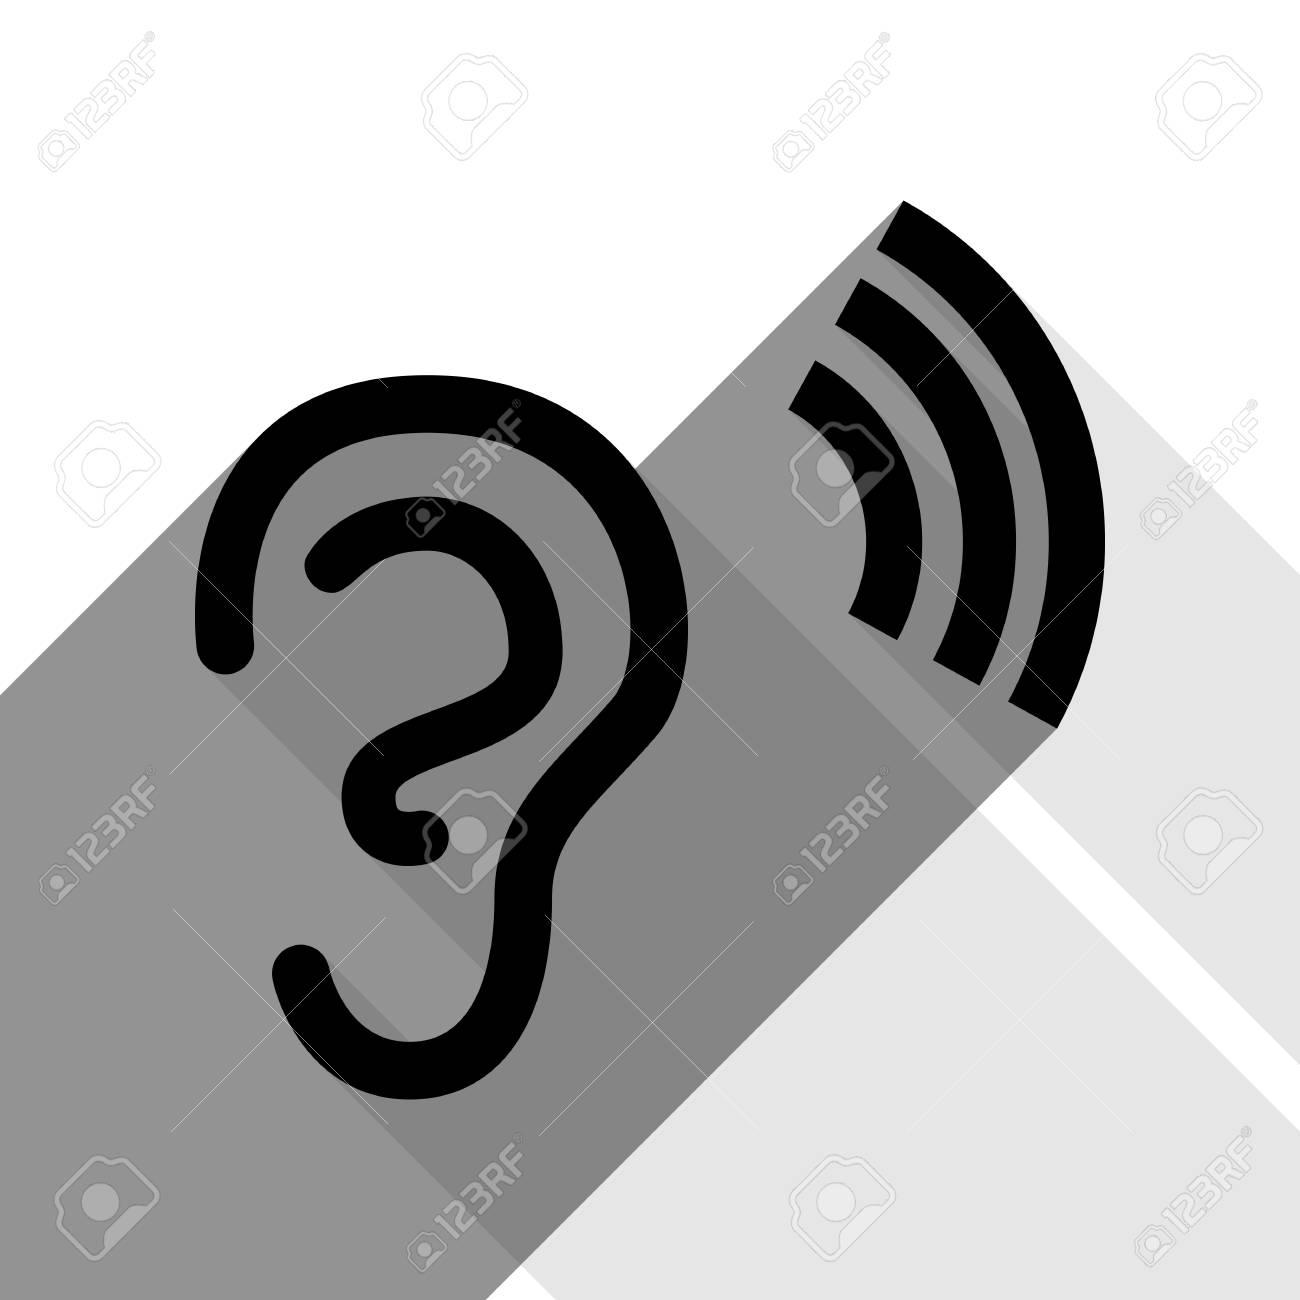 Anatomía Humana. Señal De Oído Con Soundwave. Vector. Icono Negro ...